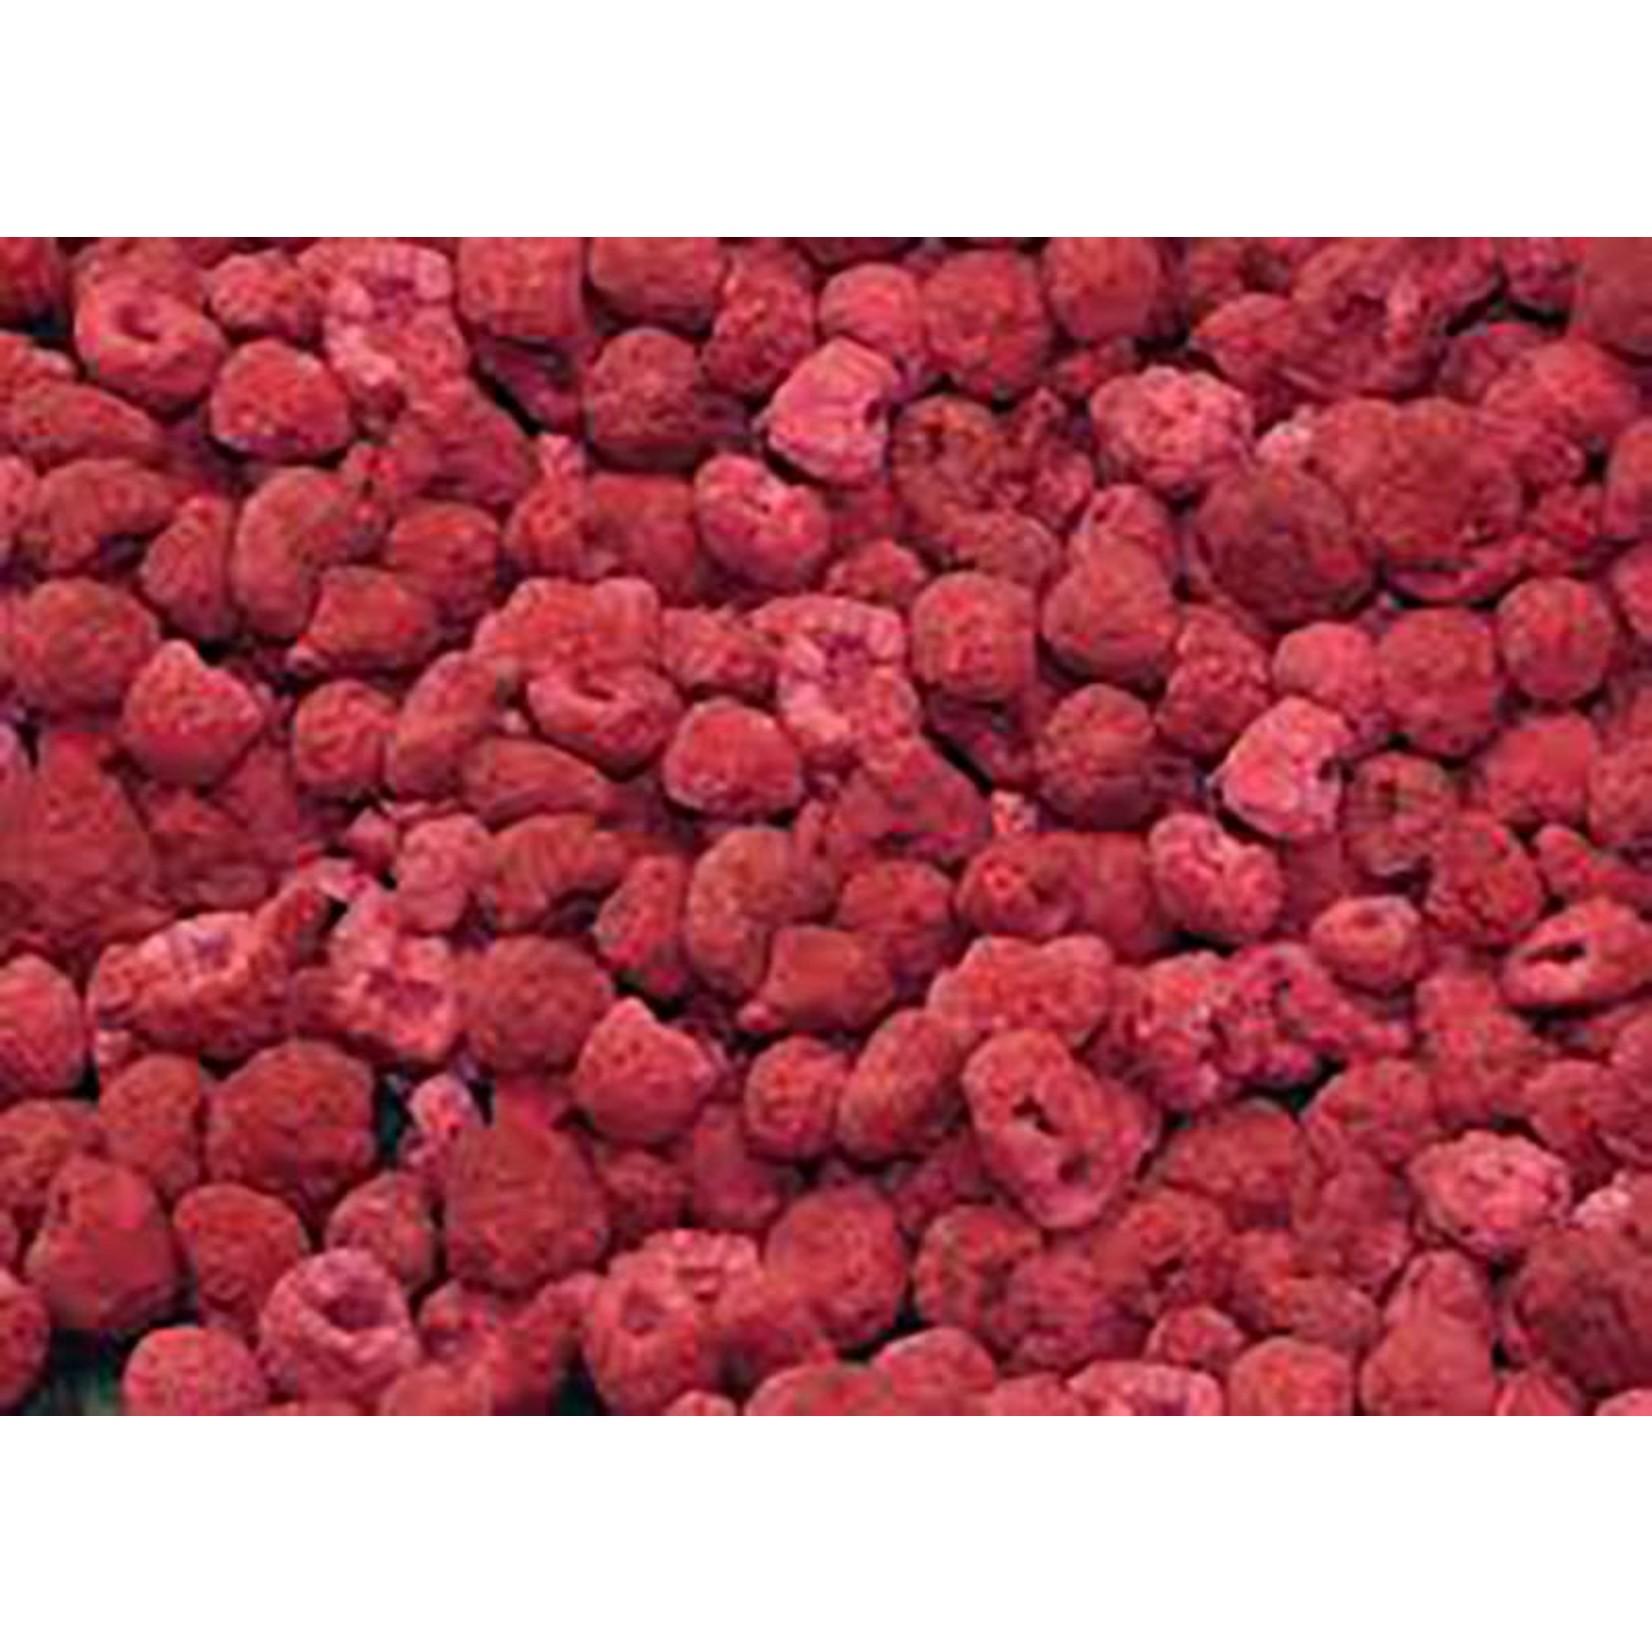 Amifruit Amifruit - Freeze dried Raspberries - 4.67oz, AMI551-R